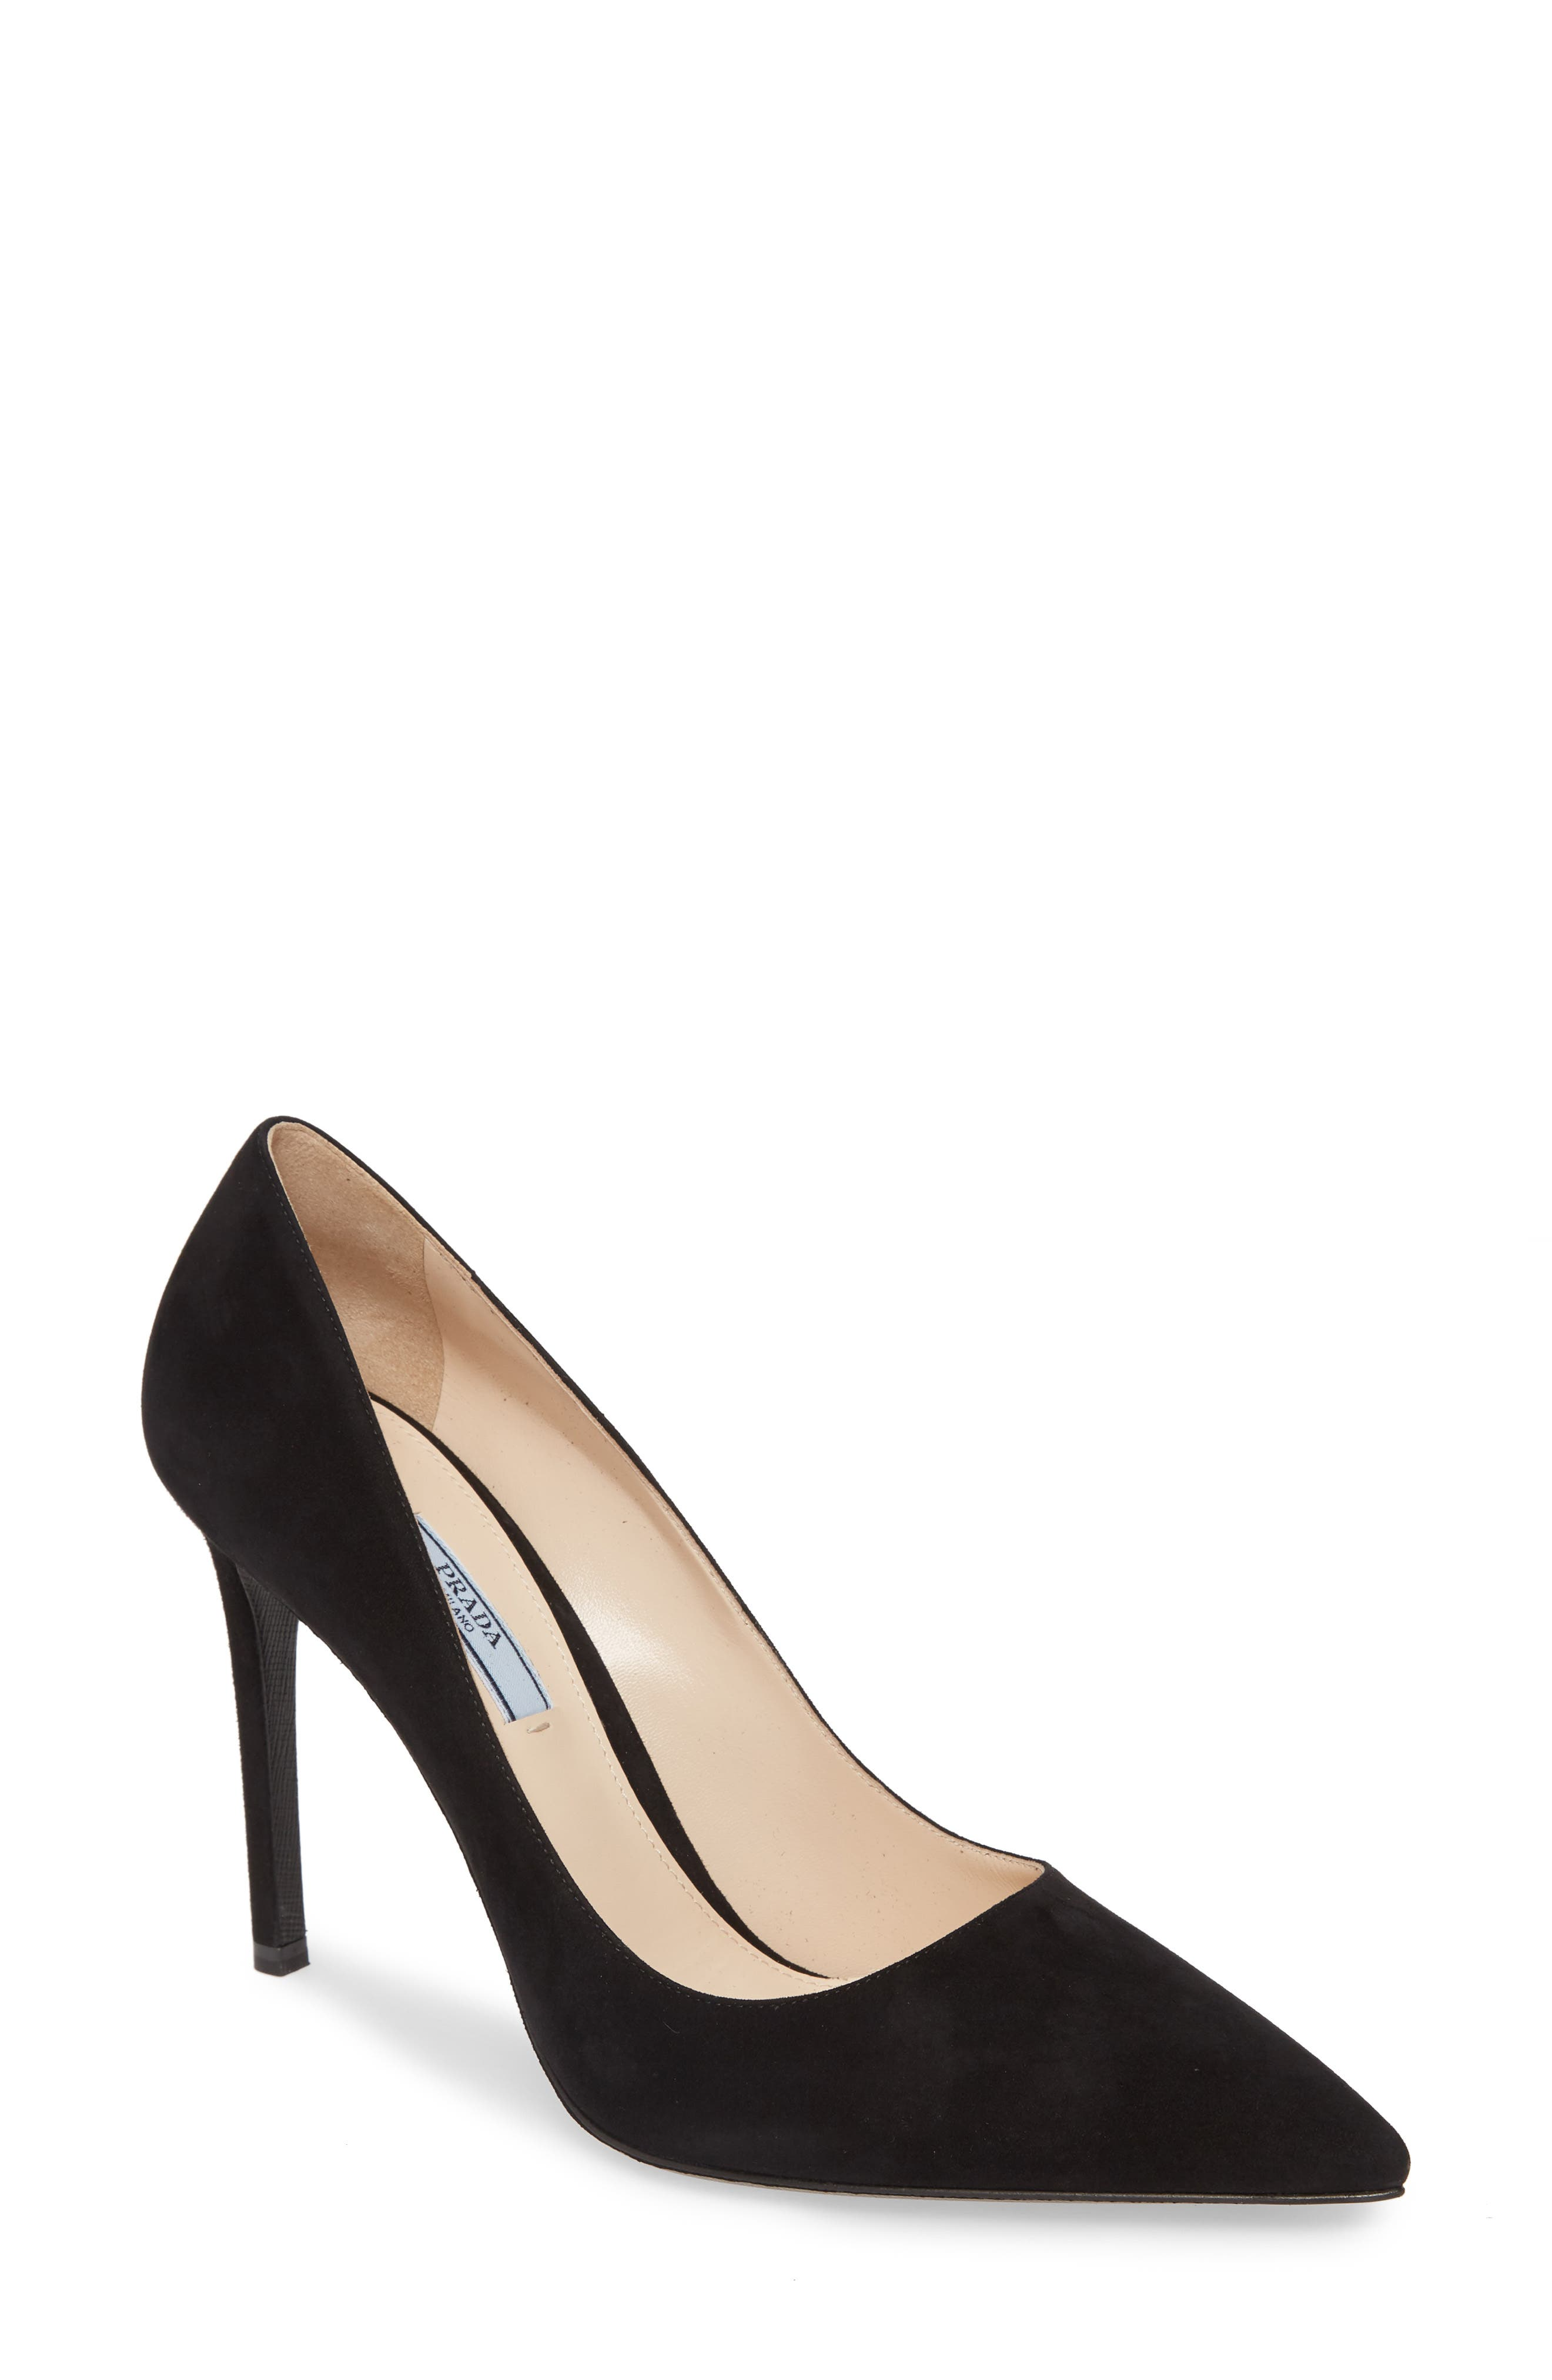 1d0289db6bd Women's Prada Shoes | Nordstrom